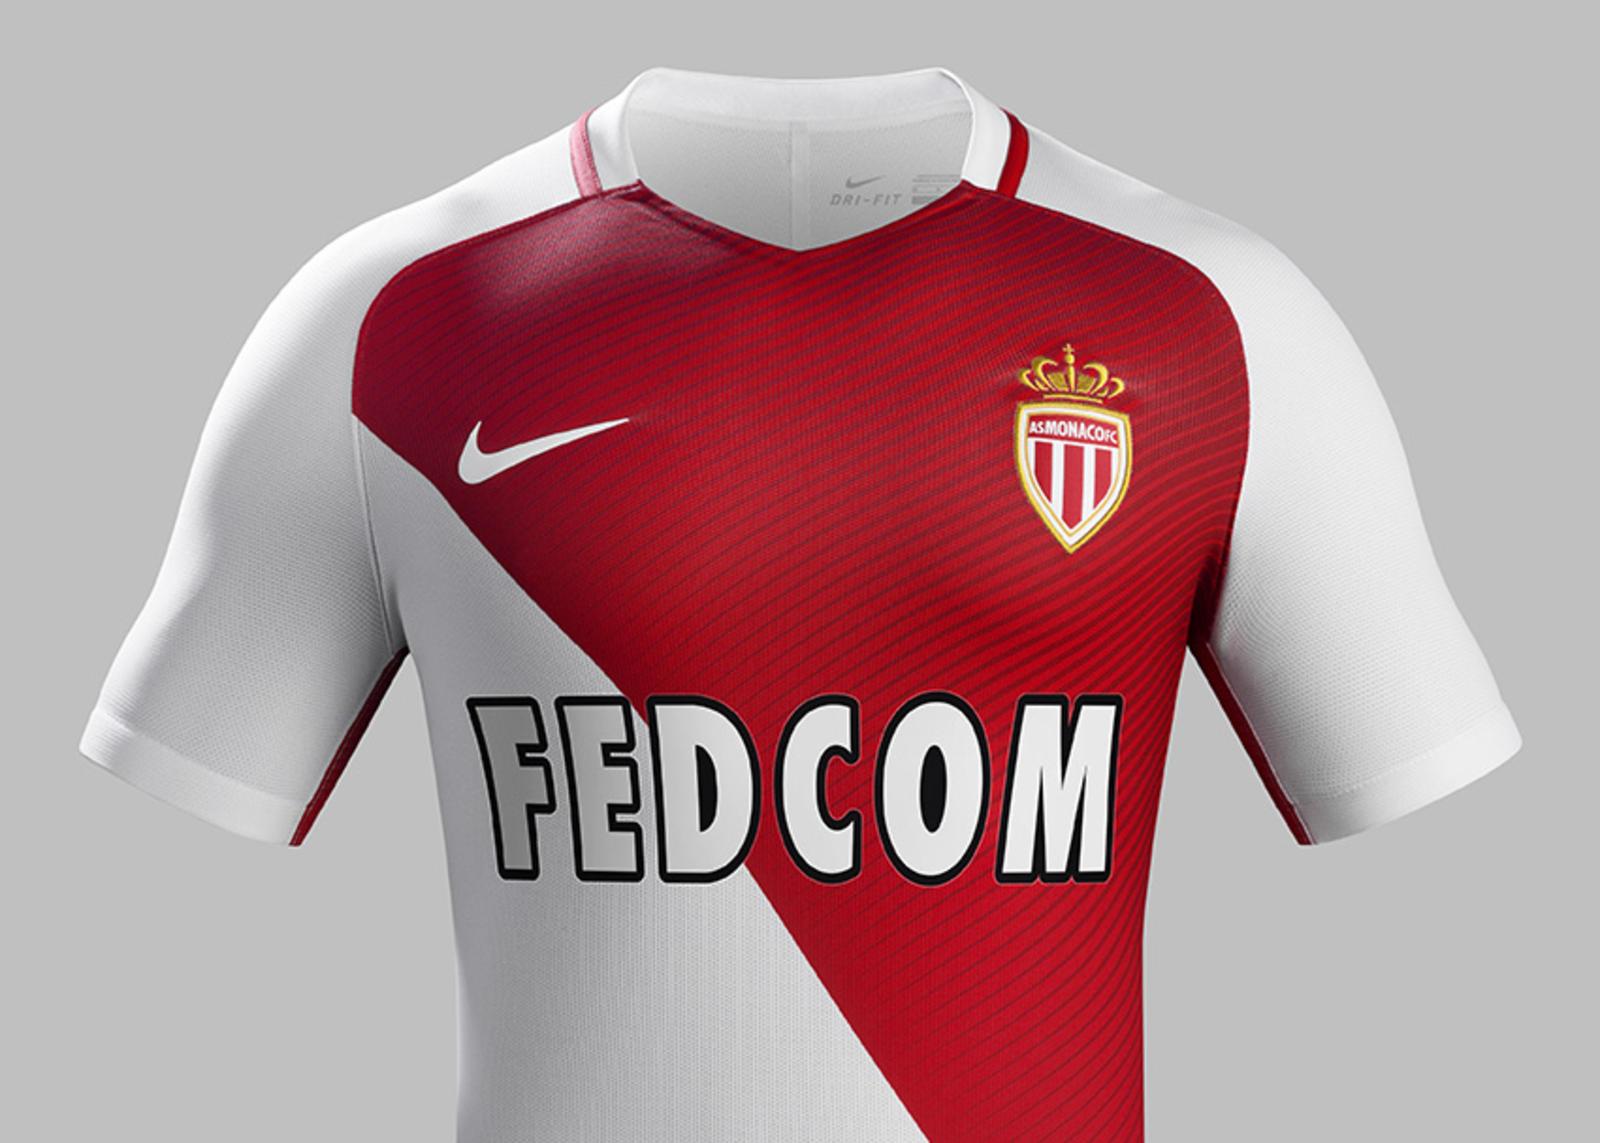 7ecc19d80 AS Monaco Home Kit 2016-17 - Nike News